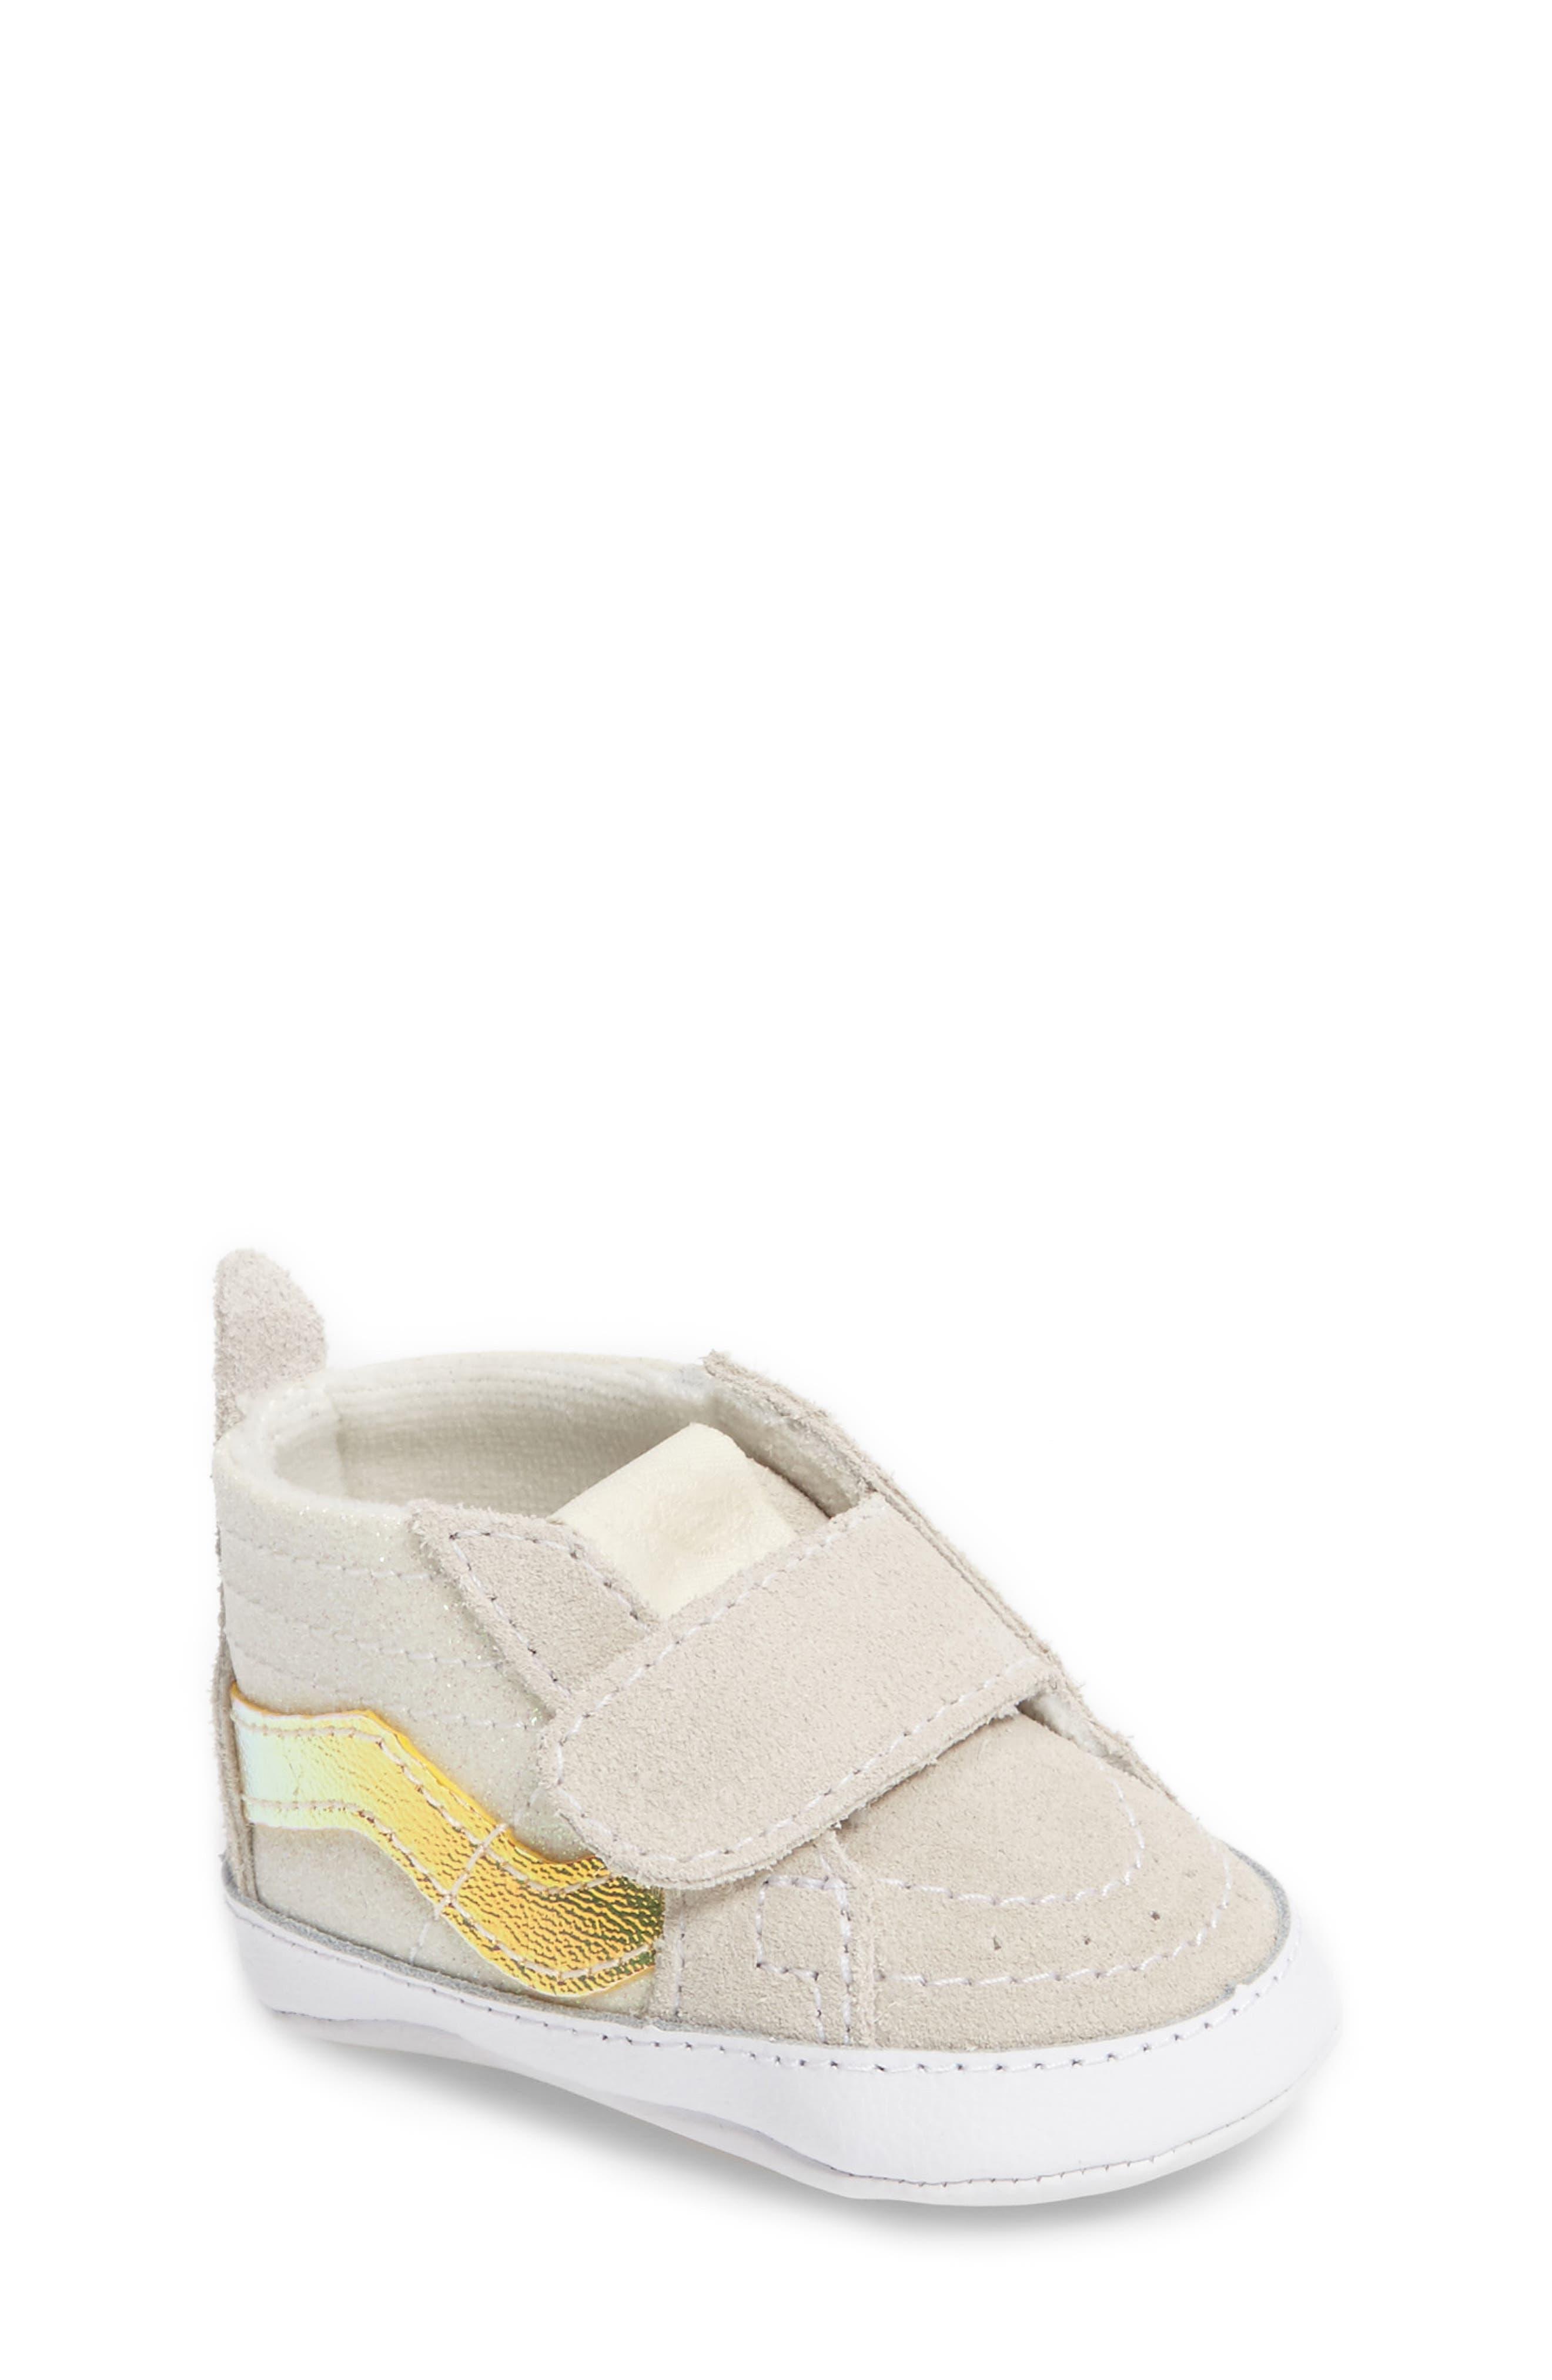 VANS 'SK8-Hi' Crib Sneaker